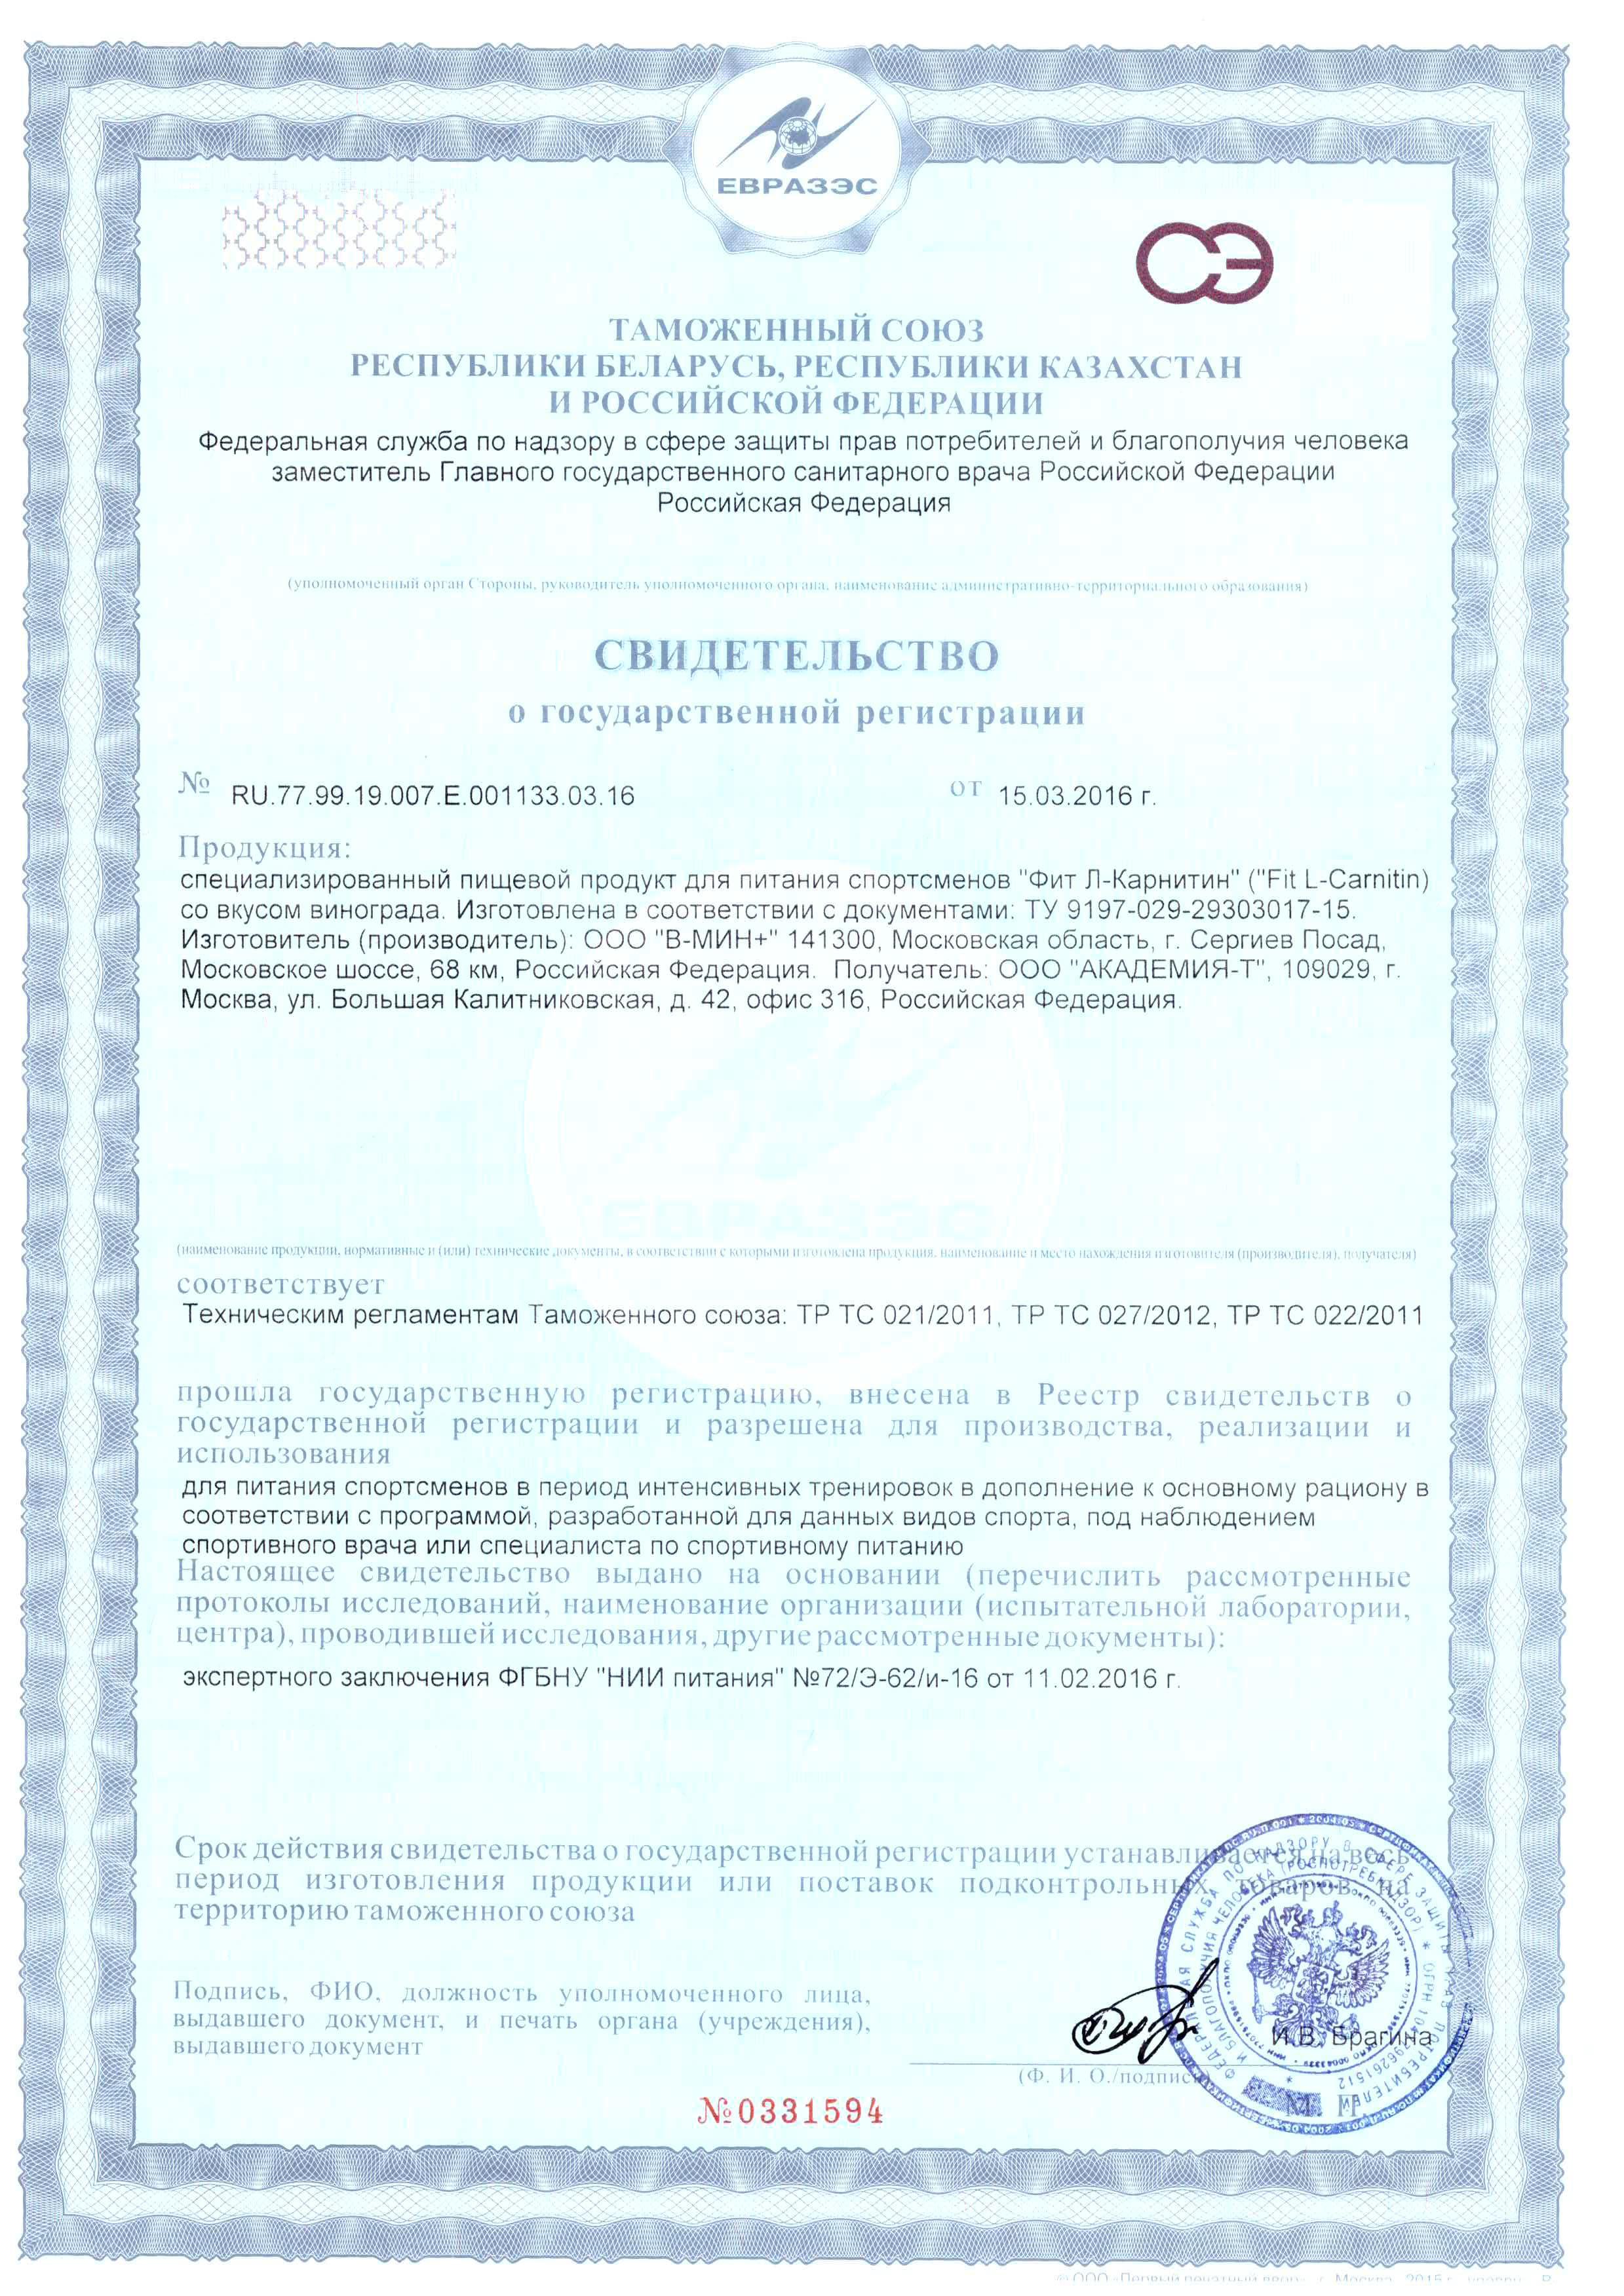 Сертификат FIT L-СARNITINE 1800